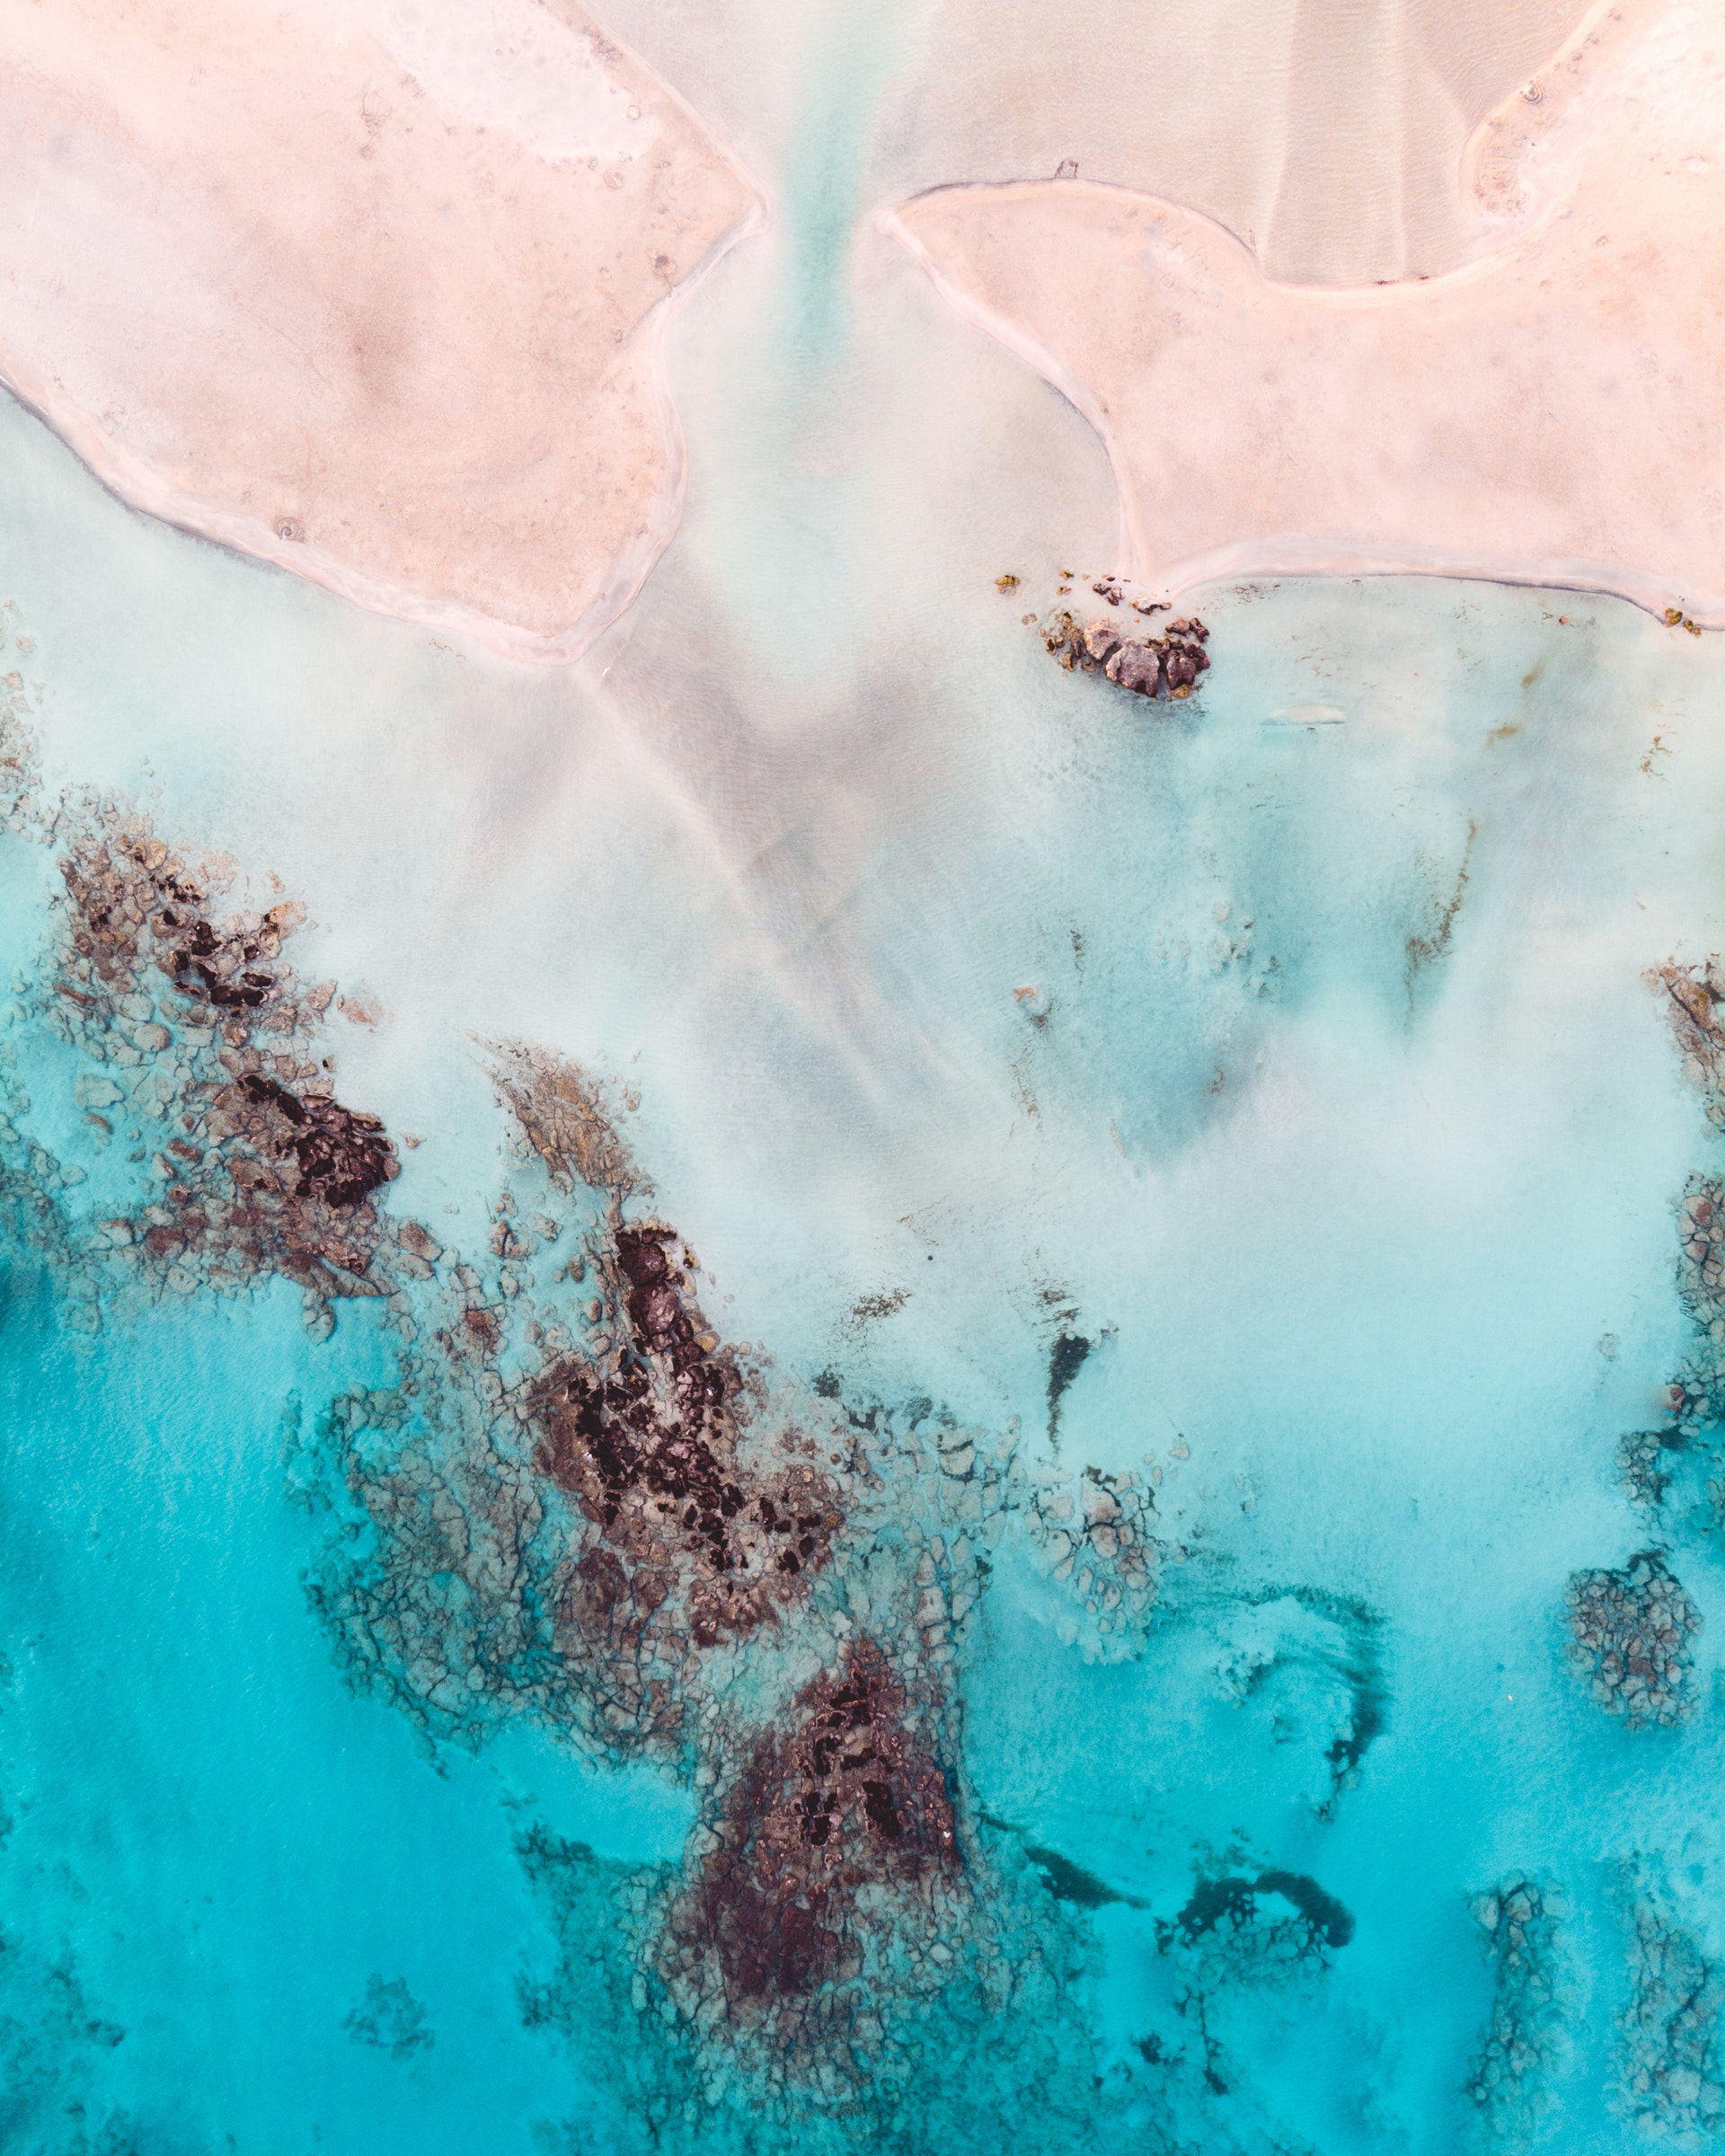 aerial-photography-bird-s-eye-view-colors-1557238.jpg